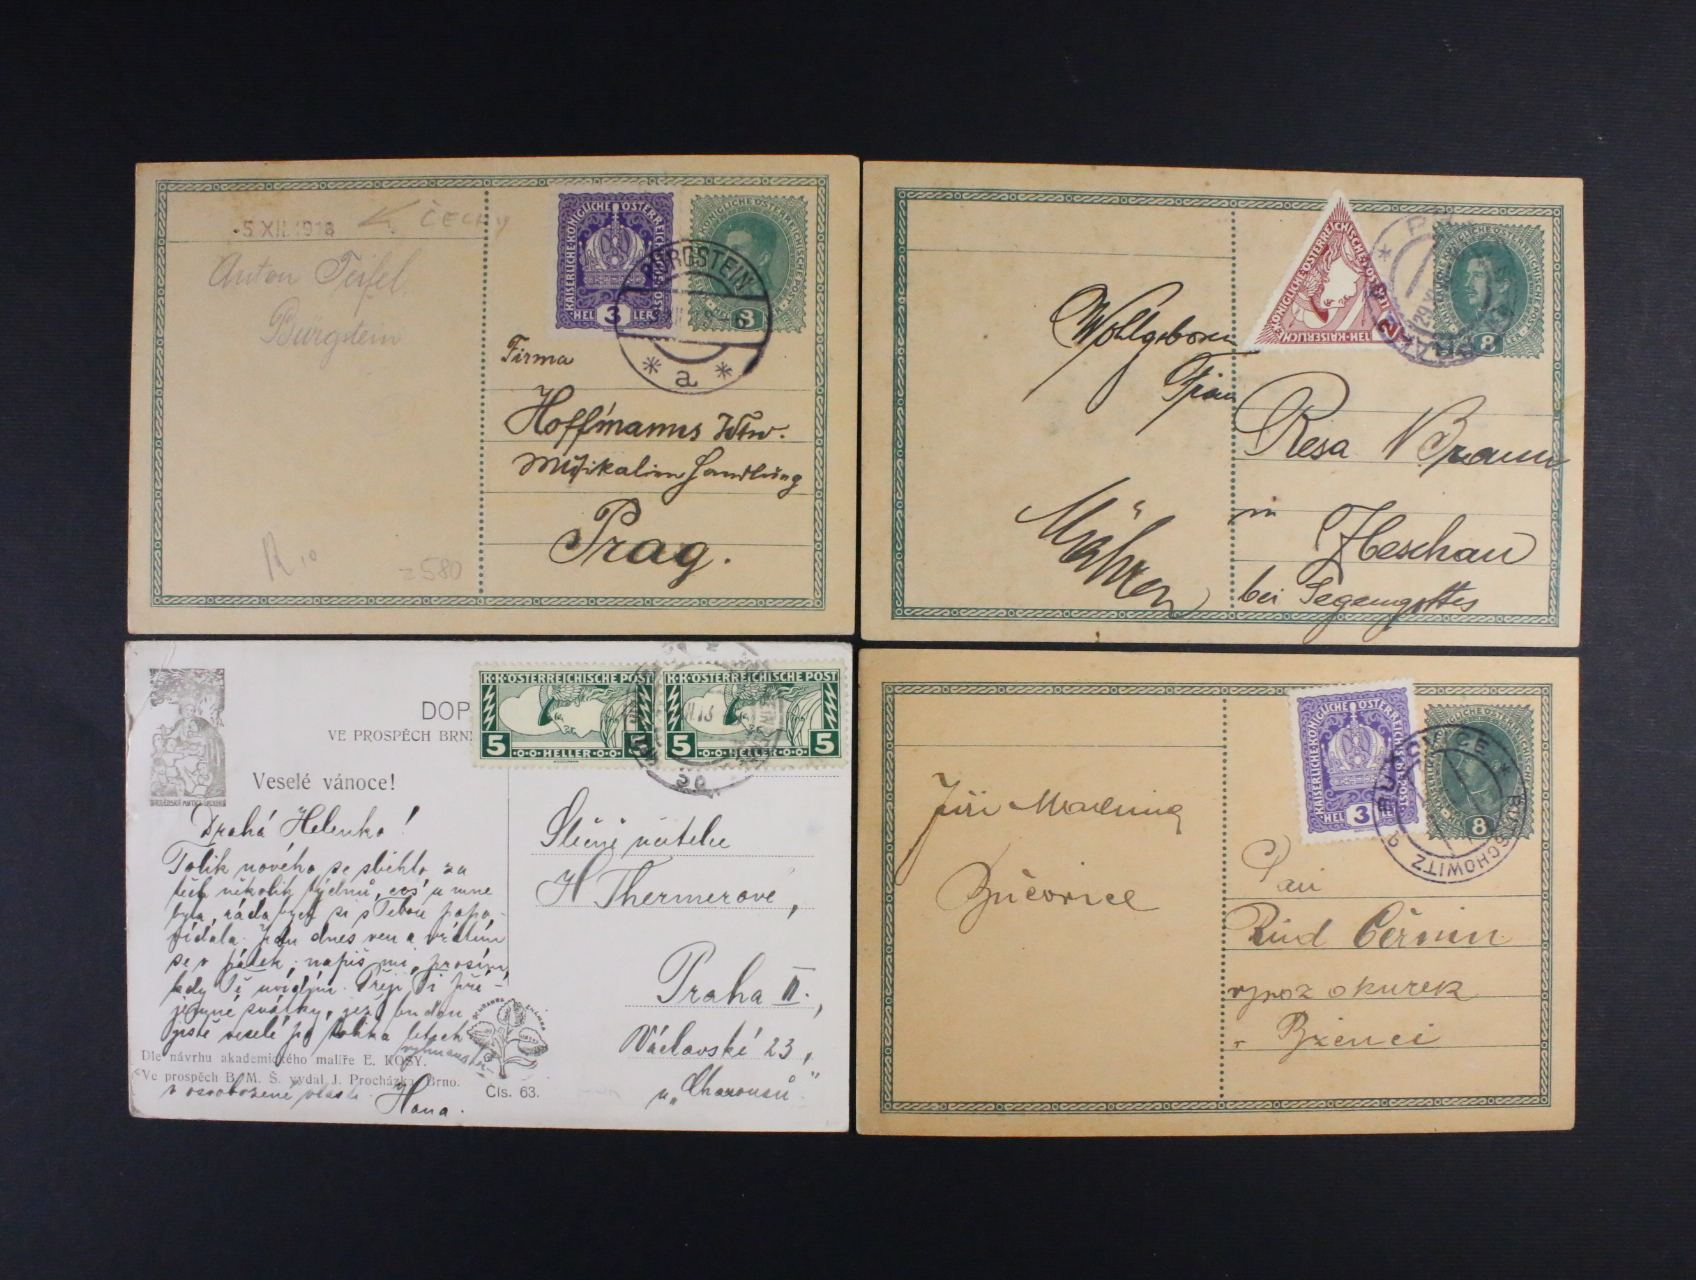 sestava 3 ks rak. KL 8h Karel dofrank. zn. Mi. č. 185 (2x), 217 (1x) + celistvost frank. zn. Mi. č. 220 A s různými raz. z r. 1918